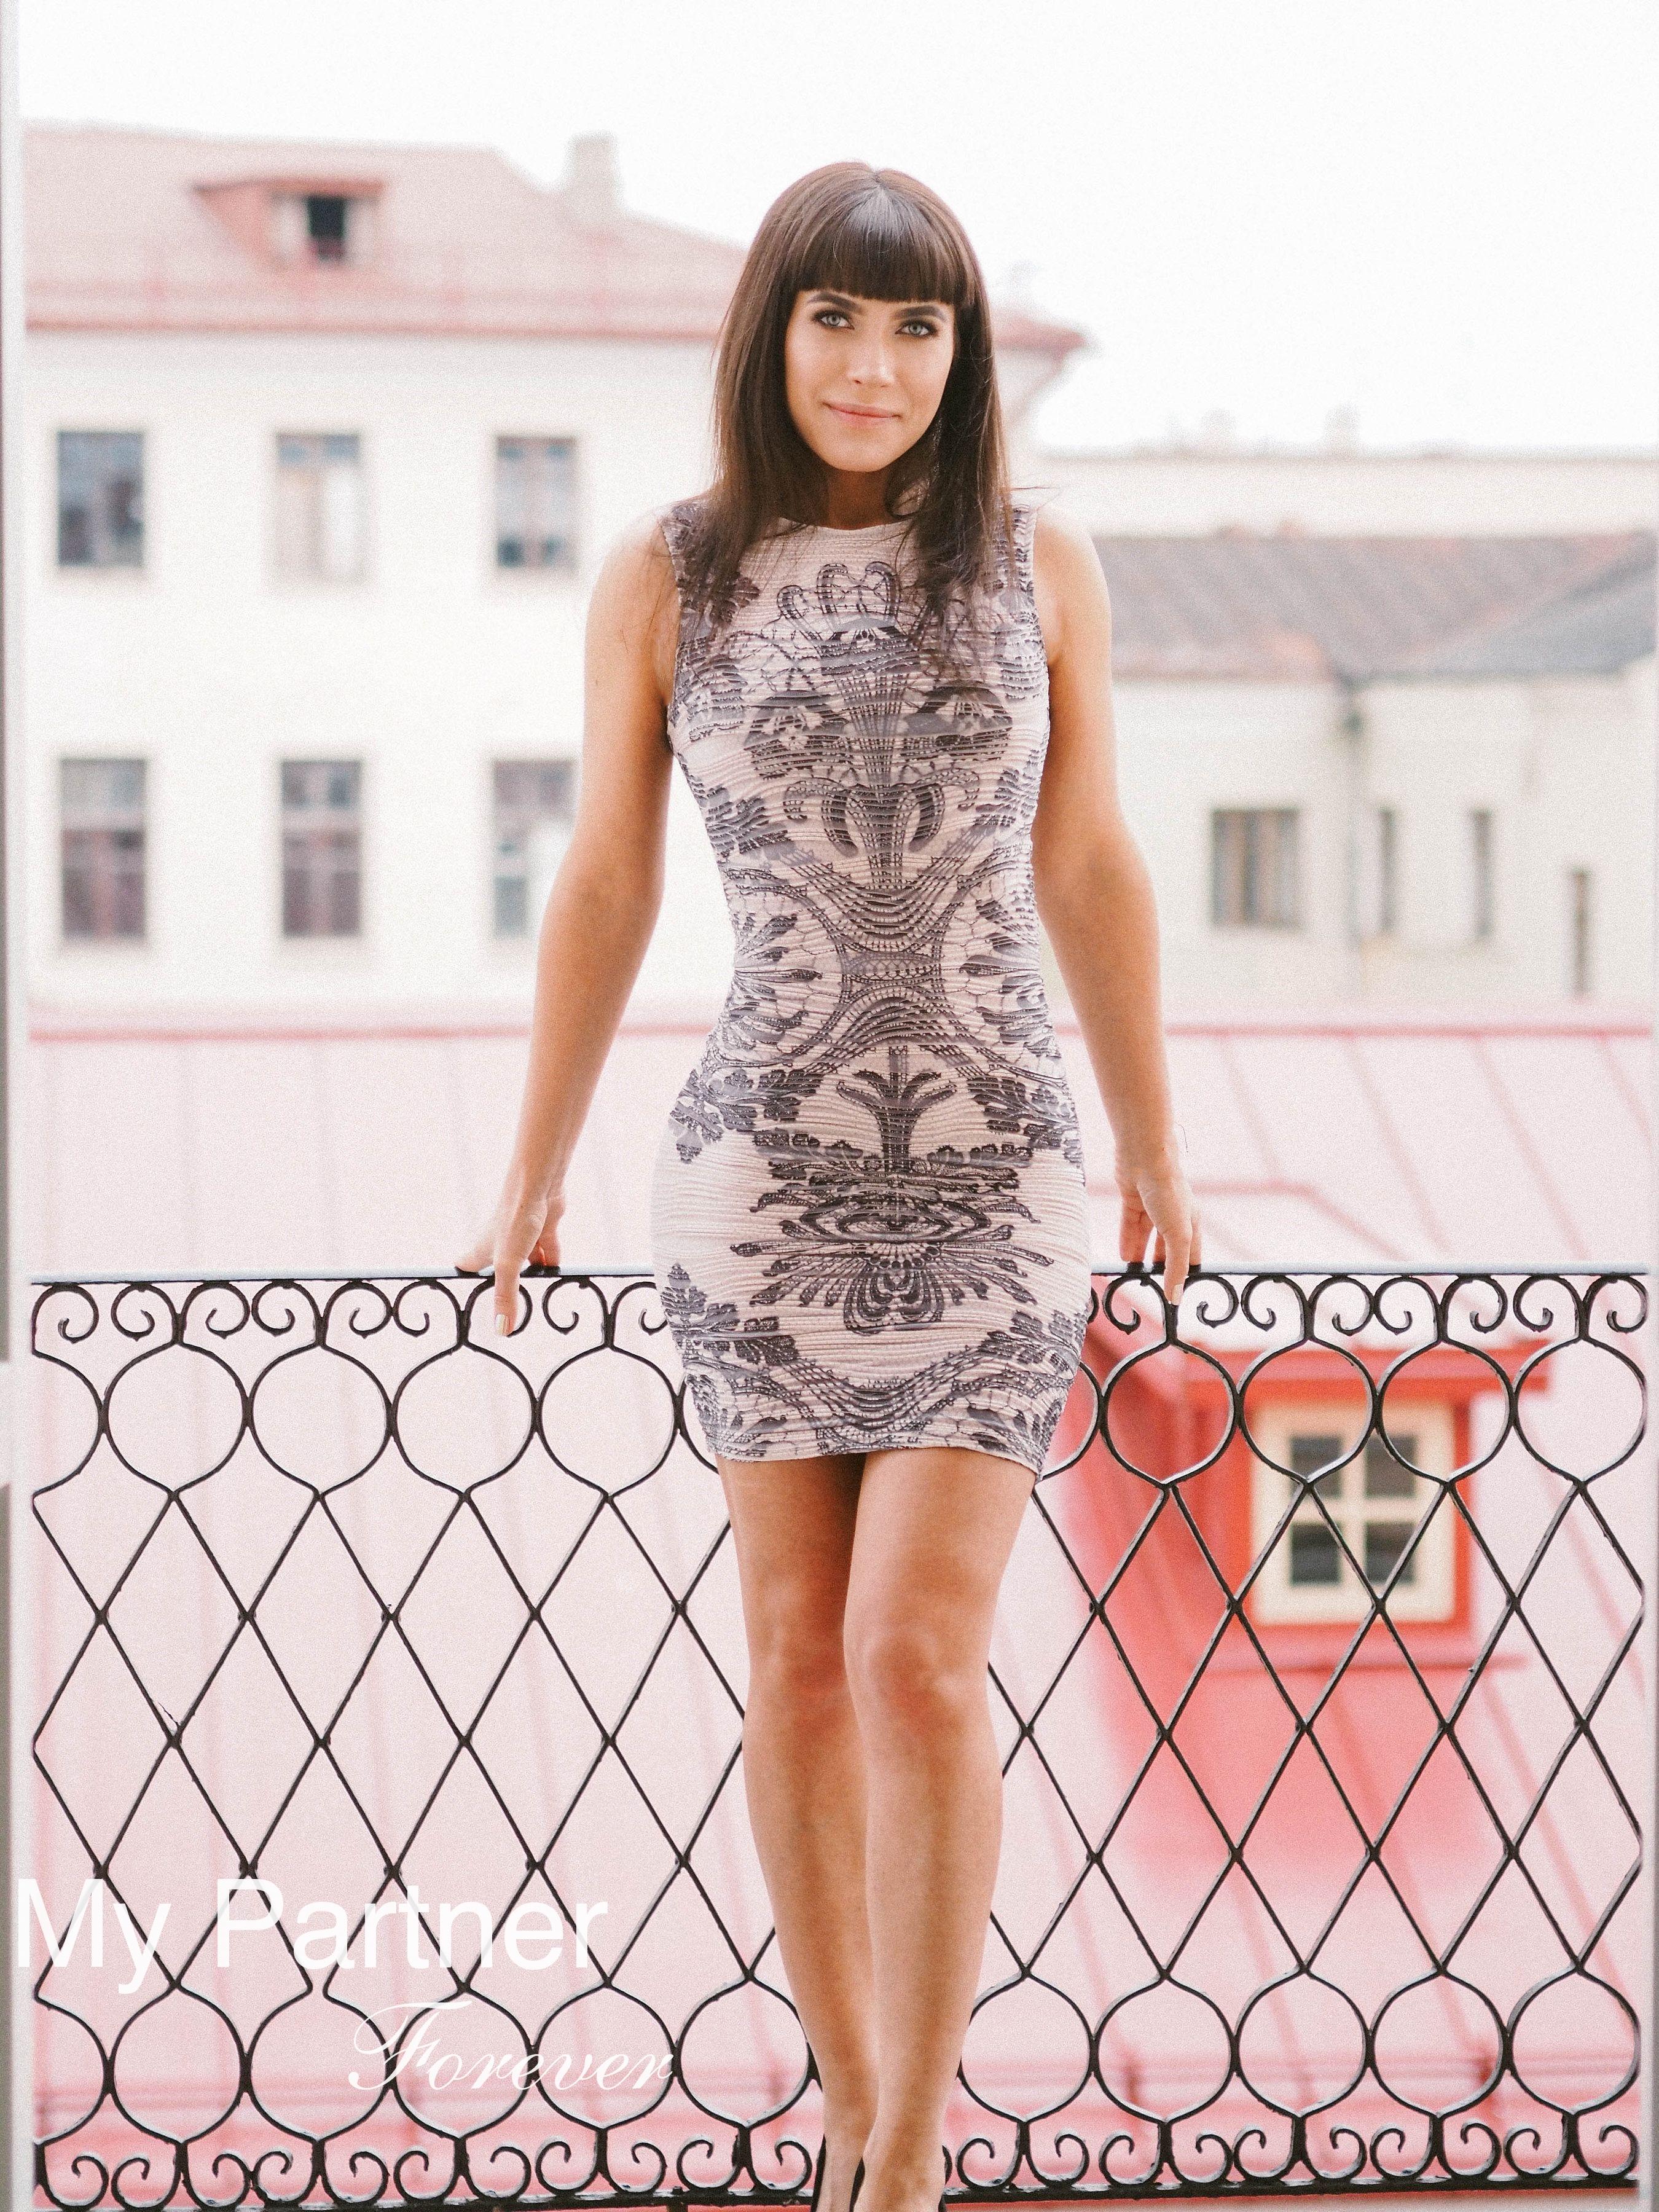 Meet Sexy Belarusian Woman Nadezhda from Grodno, Belarus